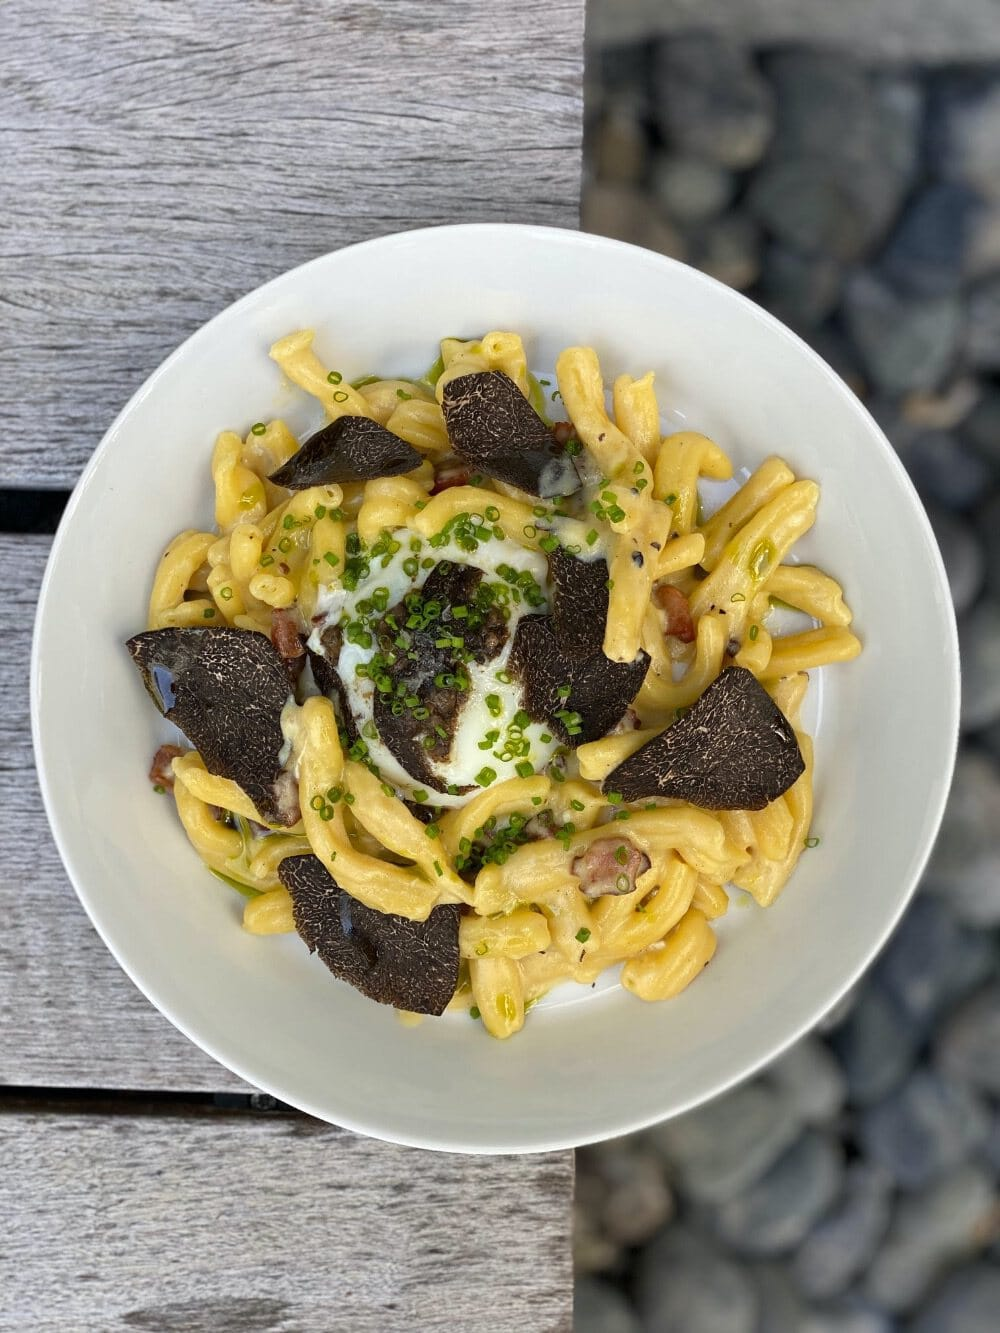 LT Steak & Seafood's Casarecce Carbonara